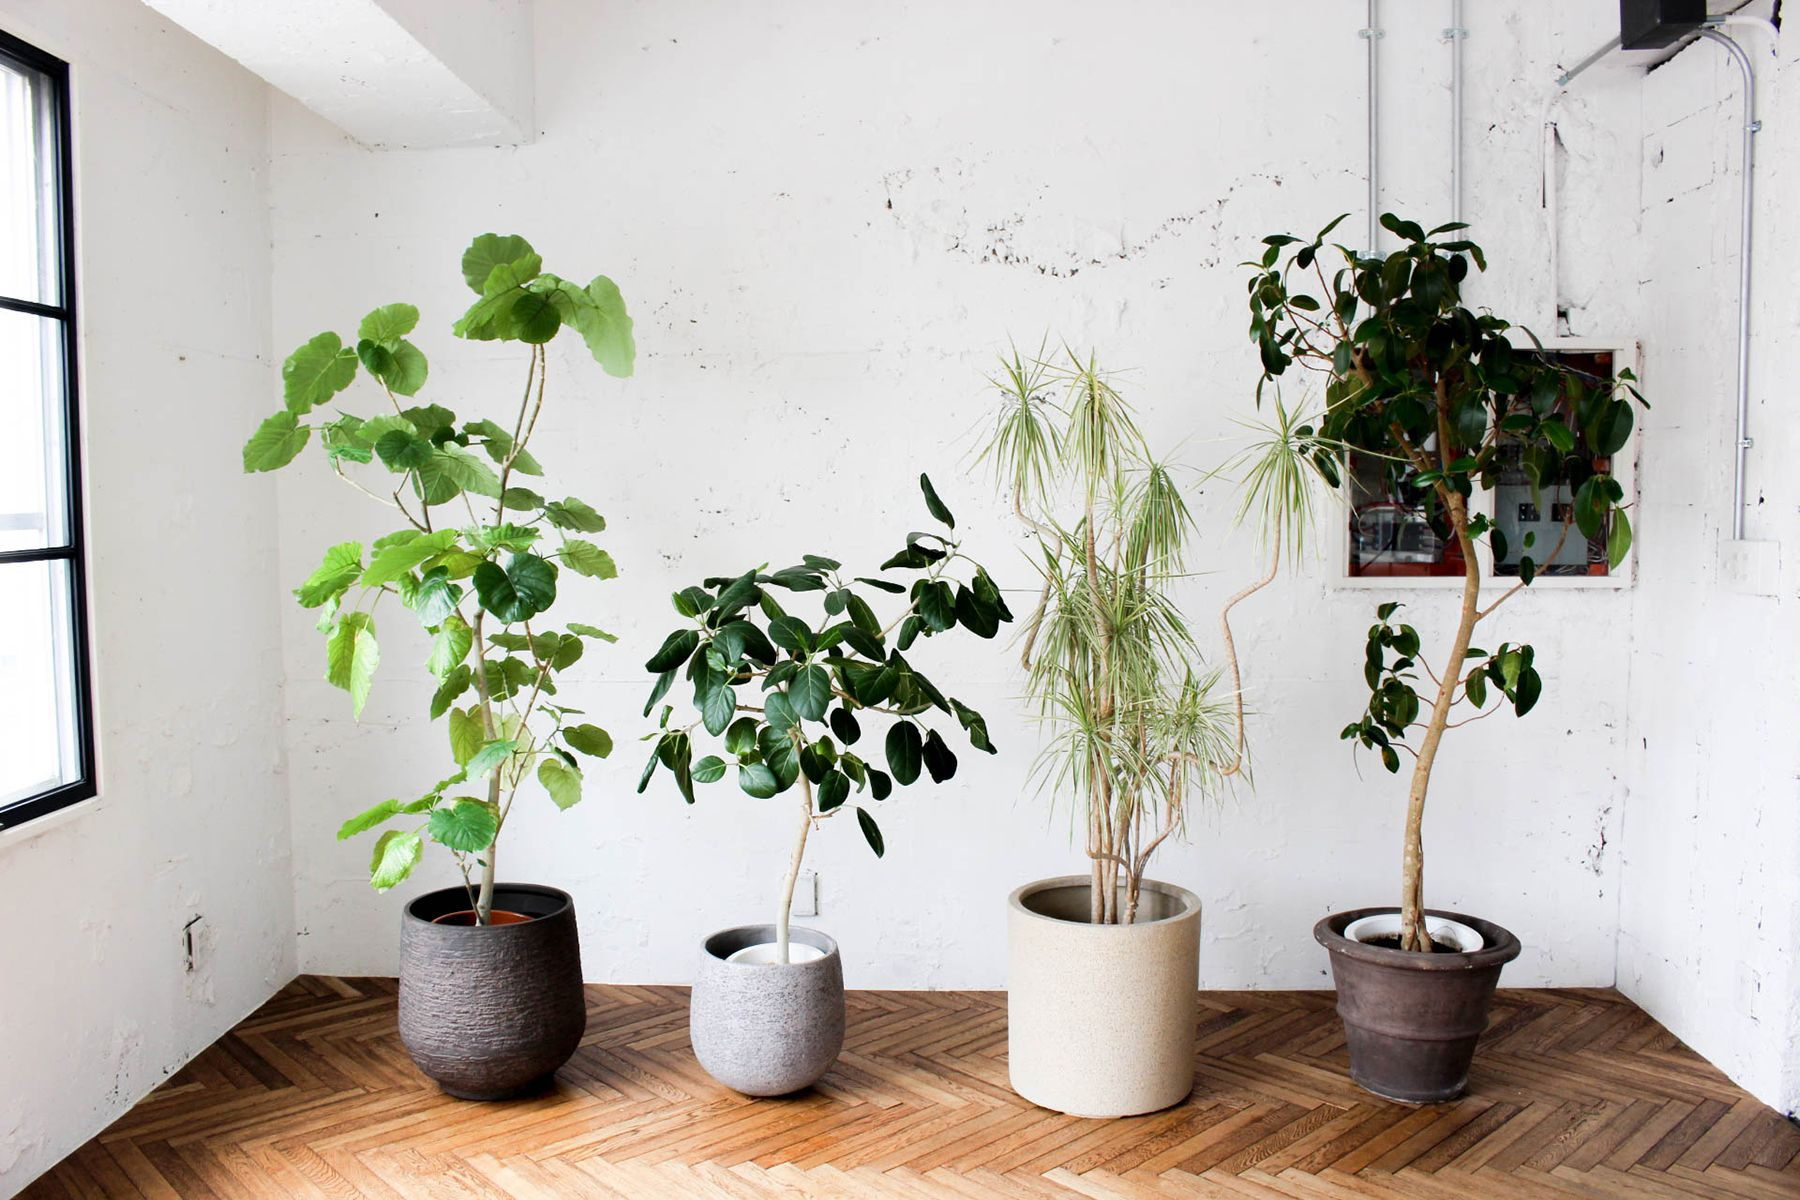 atelier rauque Cstudio (アトリエロークCスタジオ)植栽も豊富